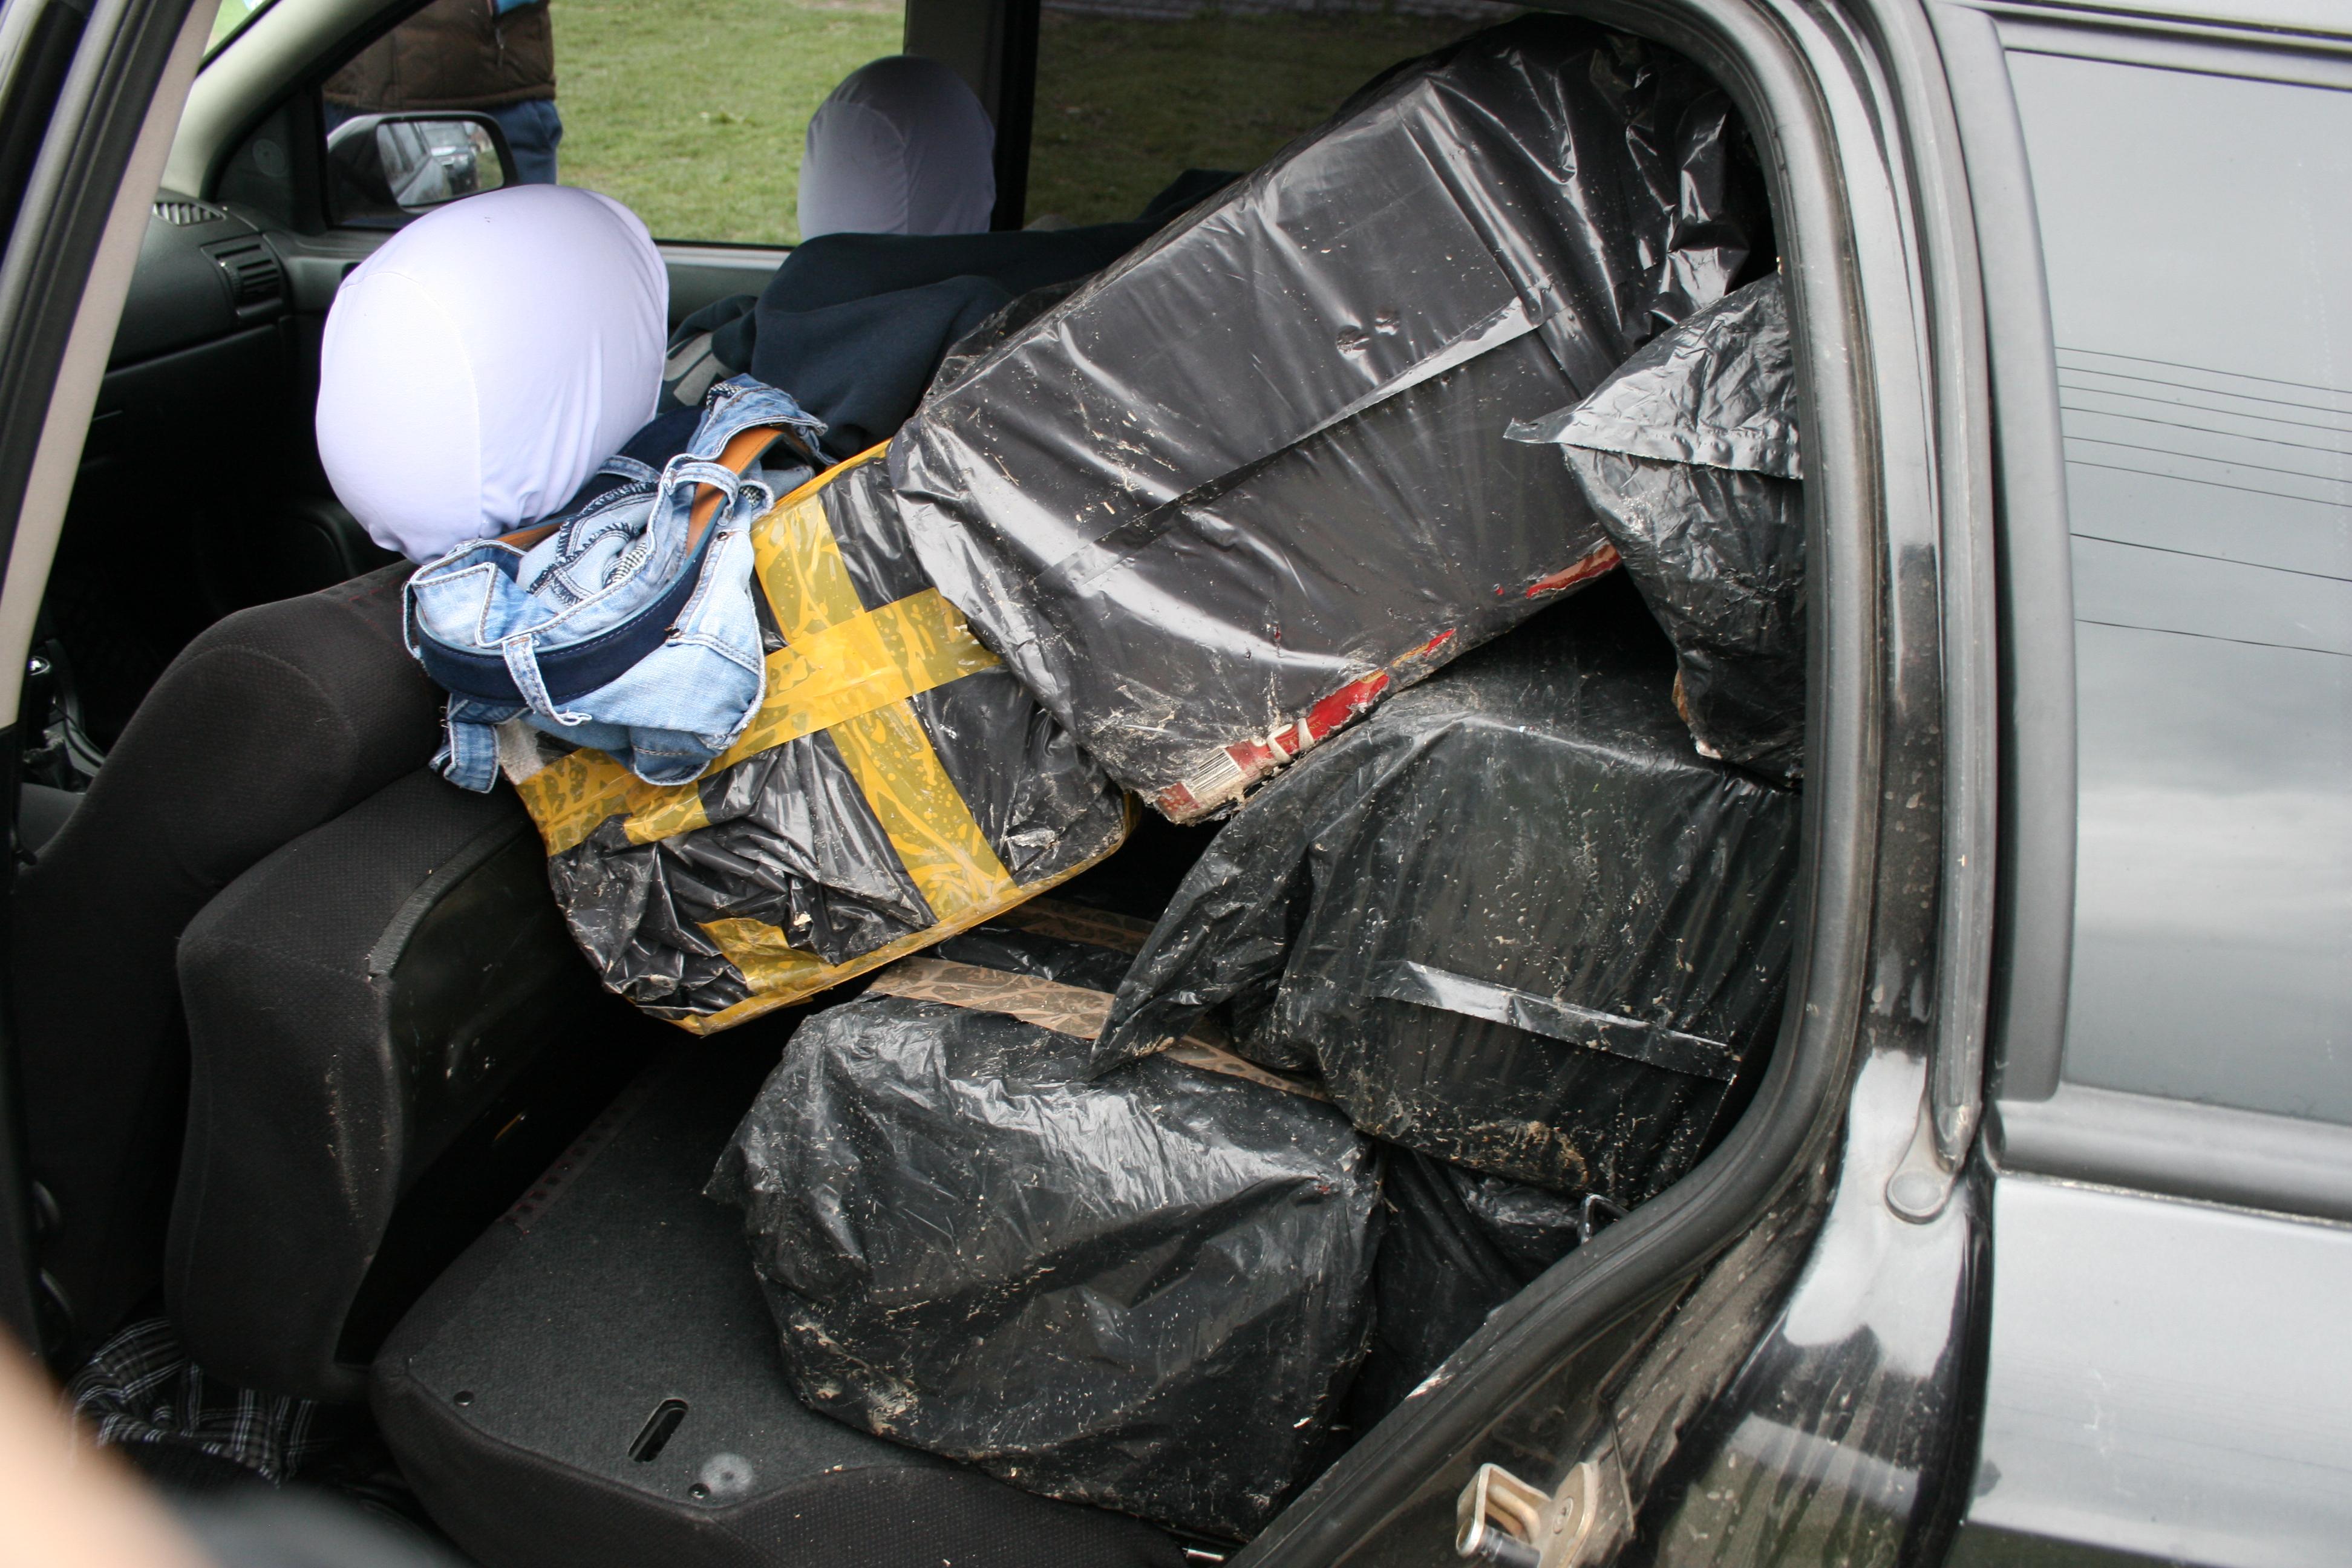 Aproape 4700 de pachete de tigari de contrabanda, descoperite in masina unui barbat din Timis